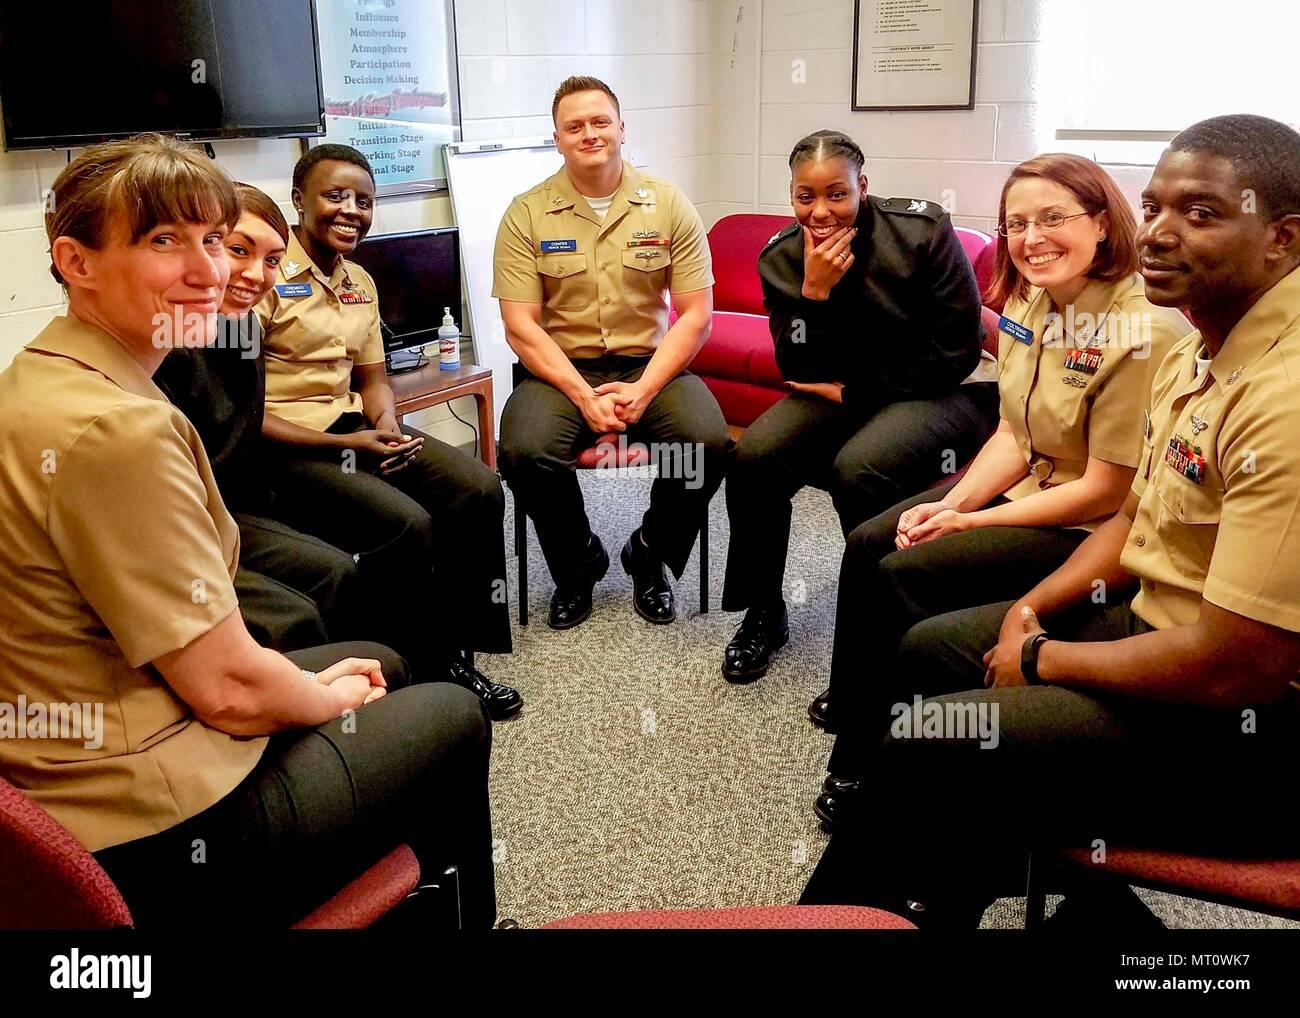 170410 N Zz999 002 San Diego April 10 2017 Sailors Attending